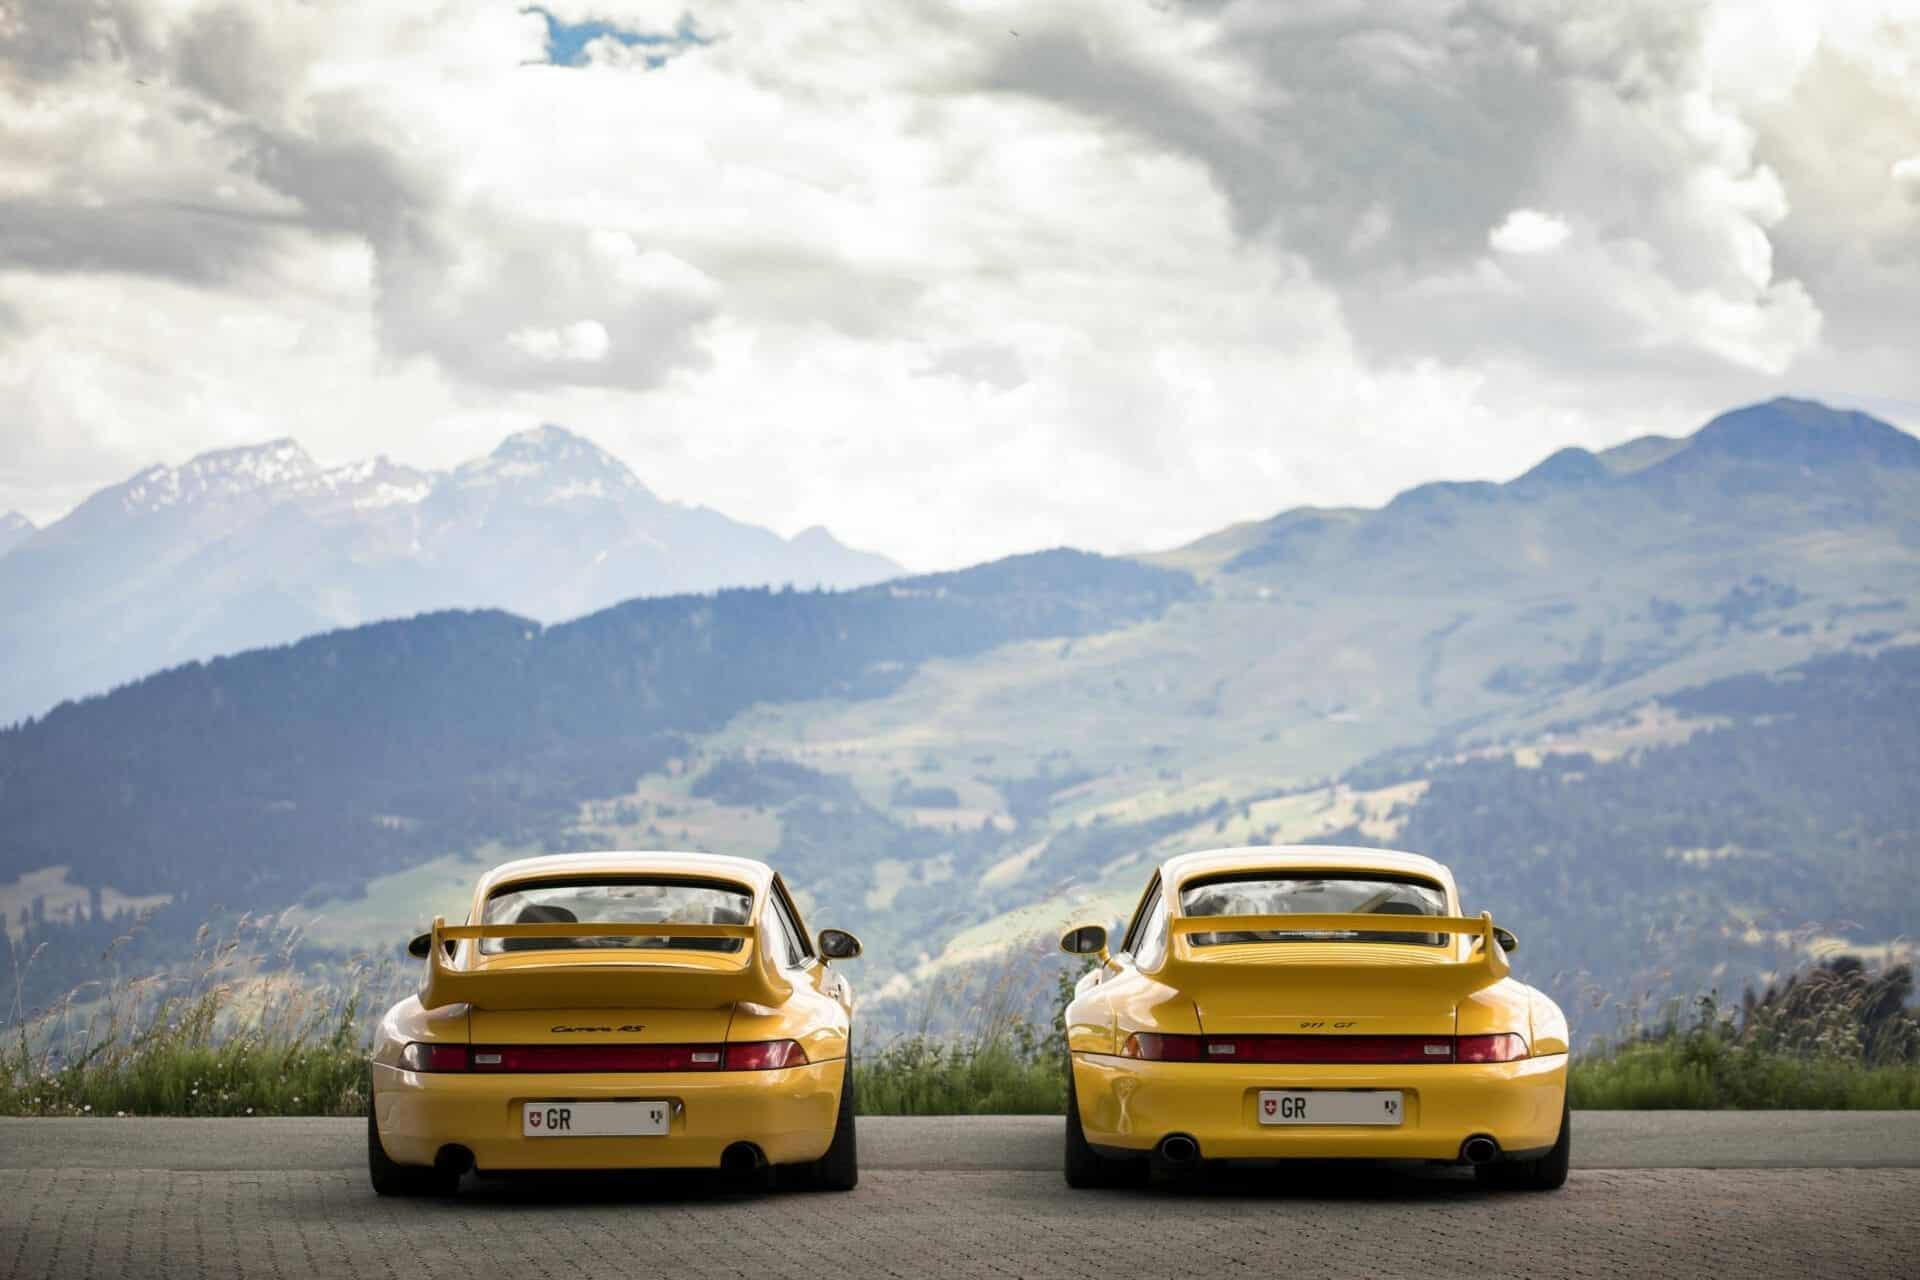 Porsche 993 GT2 Clubsport & Porsche 993 Carrera RS - Picture 15